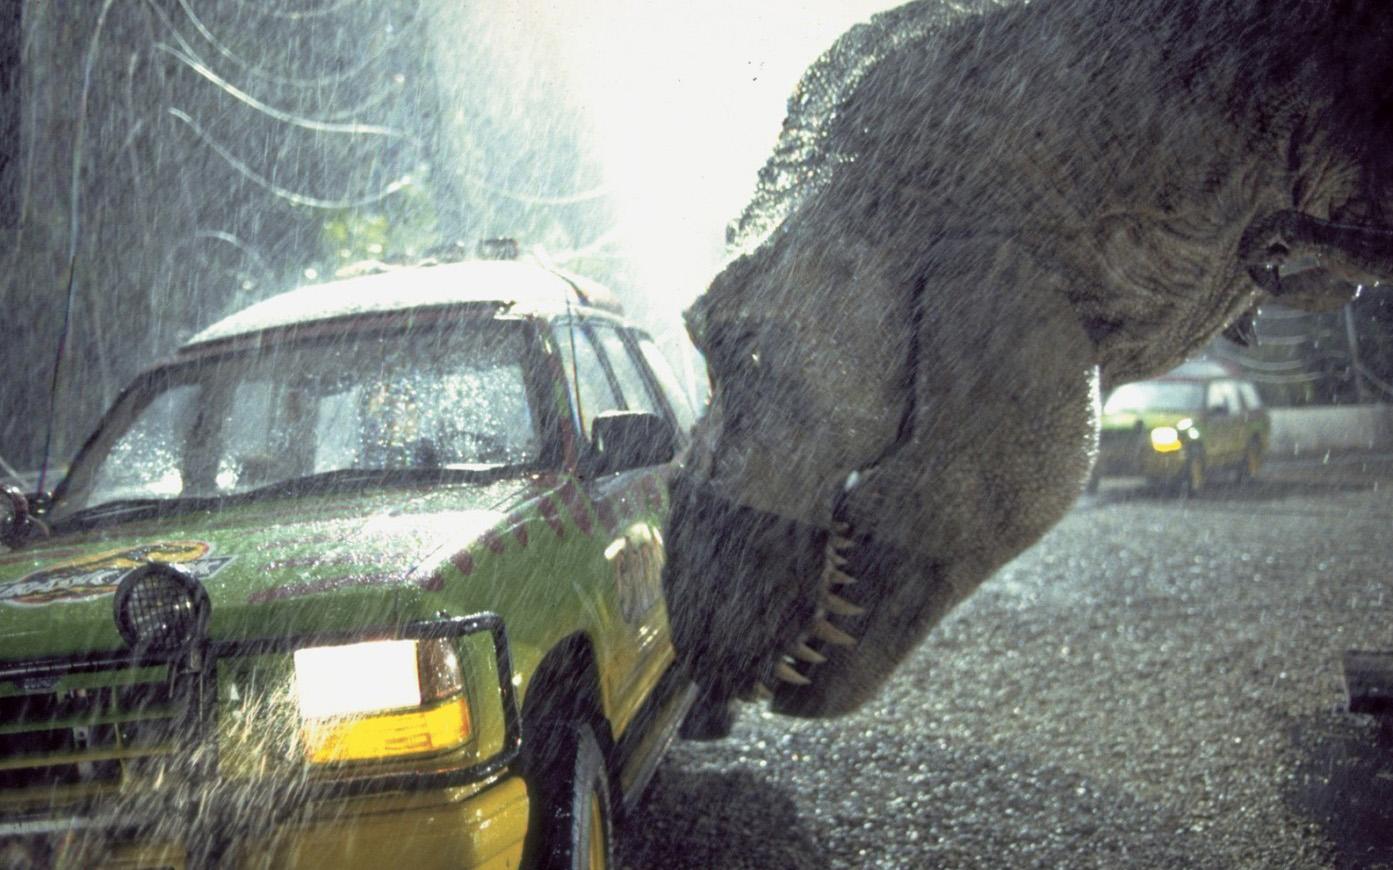 http://4.bp.blogspot.com/-nASNt5GArxI/Ty4Q3XkNEsI/AAAAAAAALYk/dKRGYplCJIA/s1600/jurassicpark+T-rex+attacking+taxi+cab.jpg